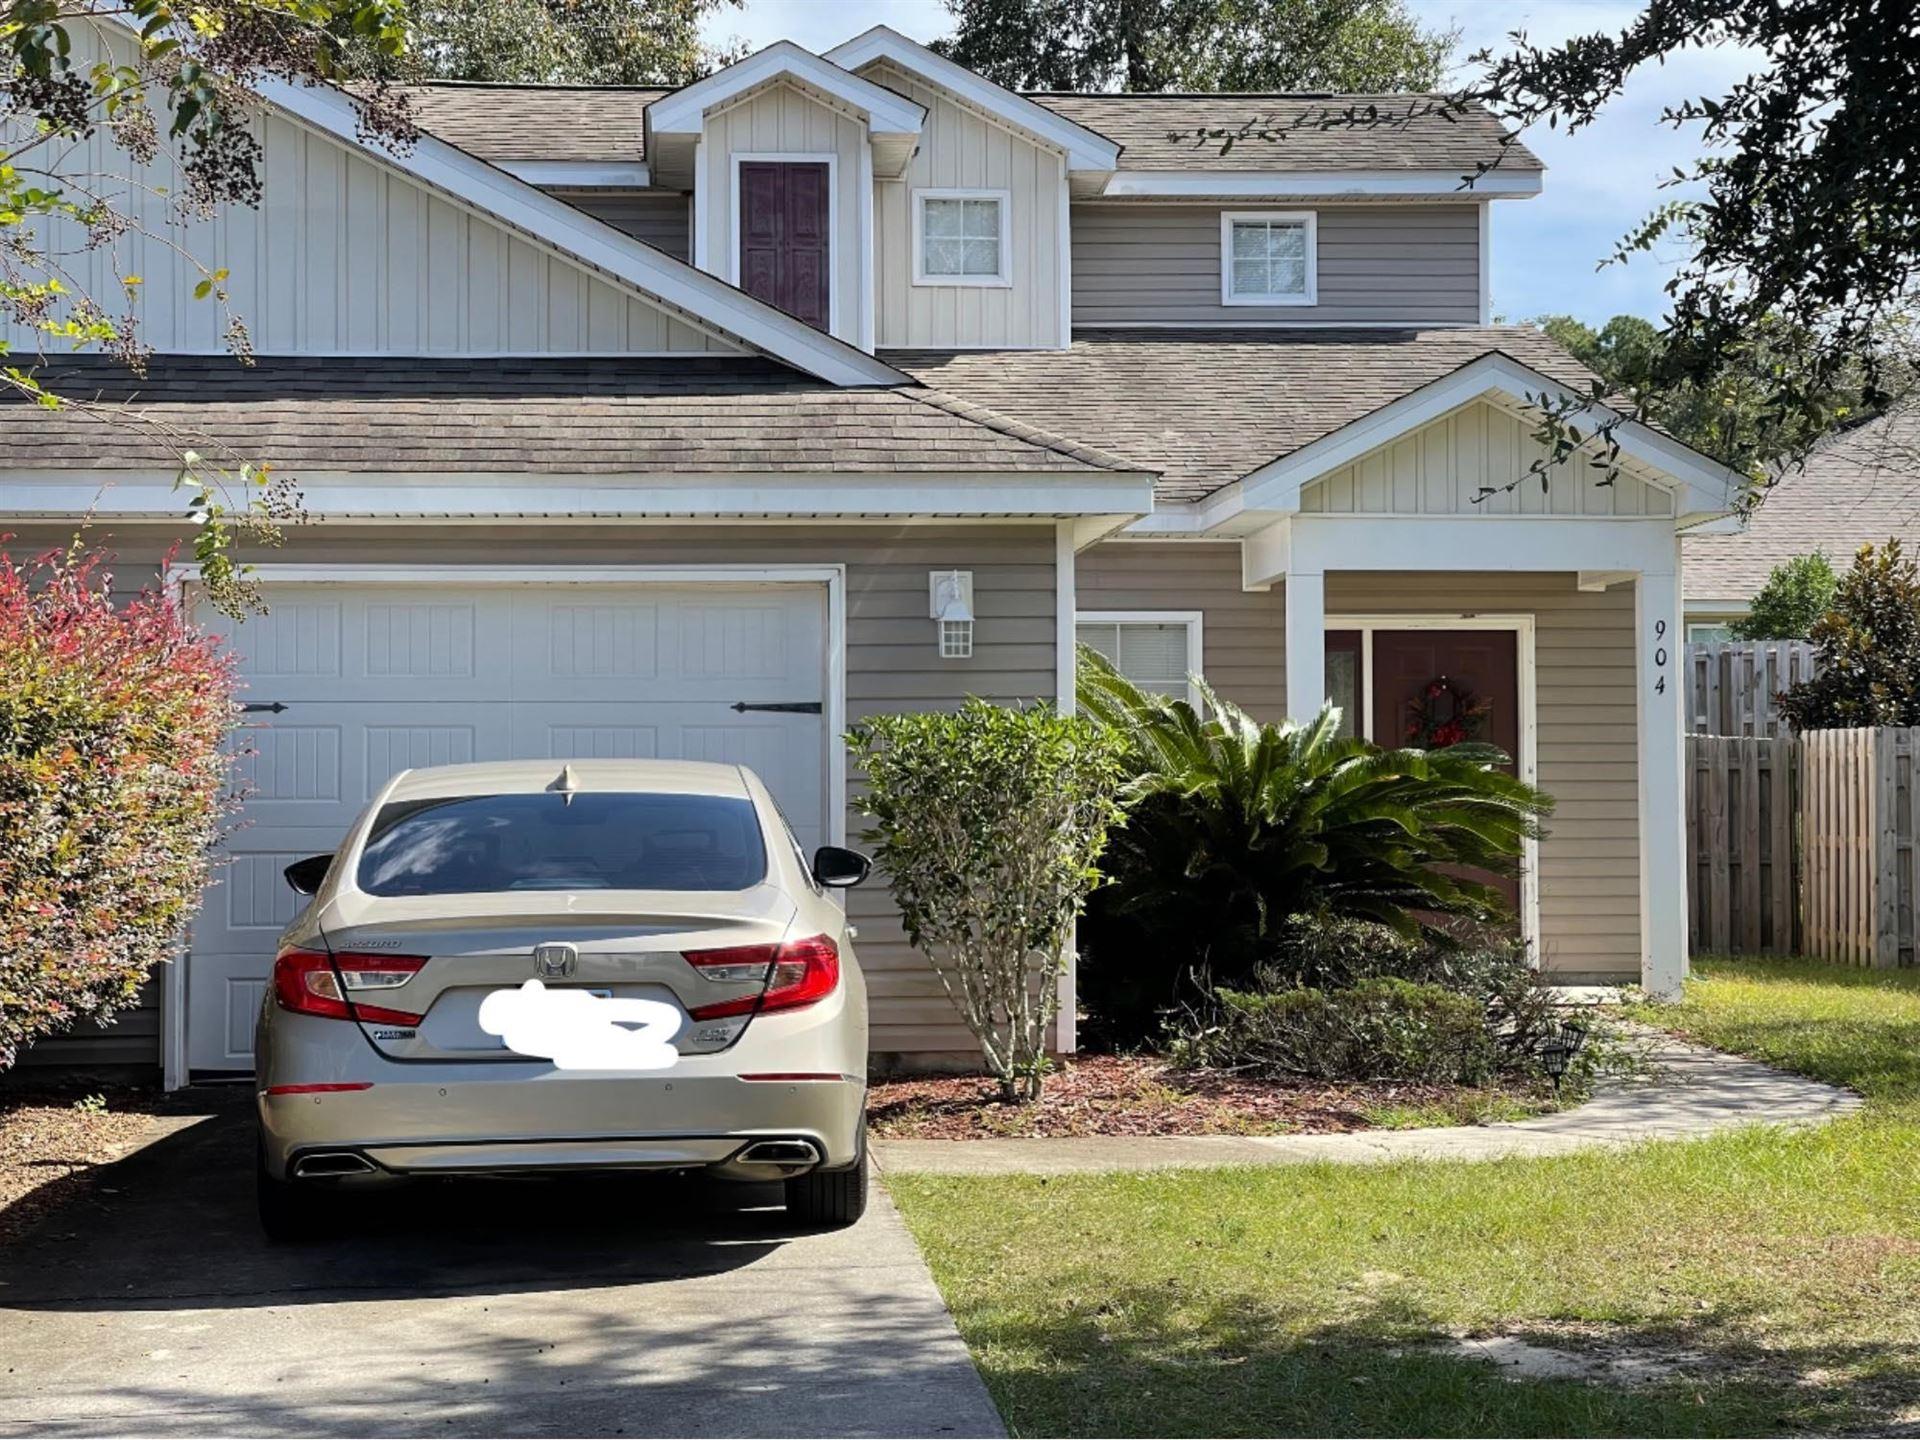 904 Chase Creek Circle, Tallahassee, FL 32311 - MLS#: 338710